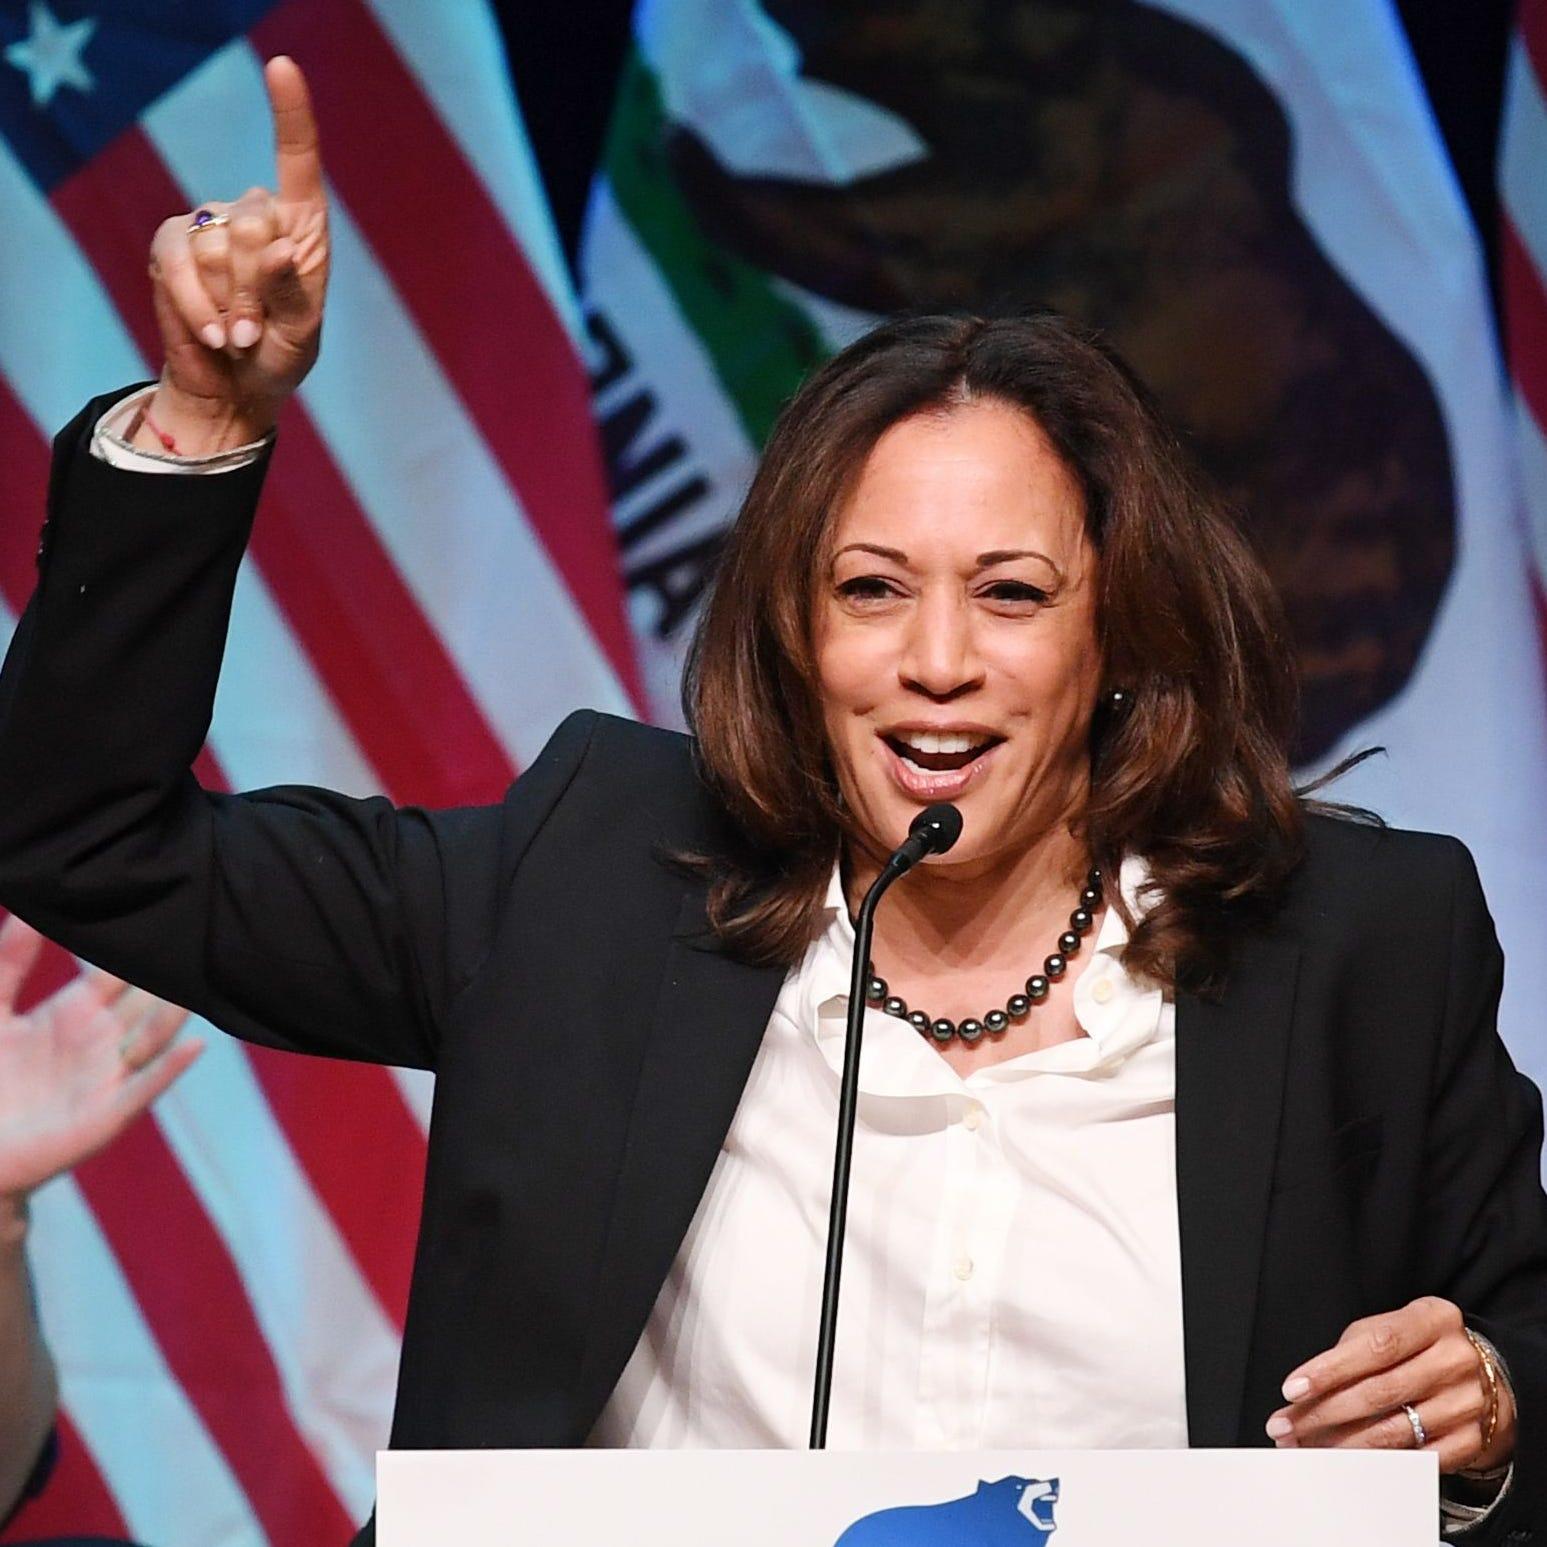 Sen. Kamala Harris, D-Calif., speaks at a rally for California gubernatorial candidate Gavin Newsom before the mid-term elections in Santa Clarita, California, on Nov. 3, 2018.